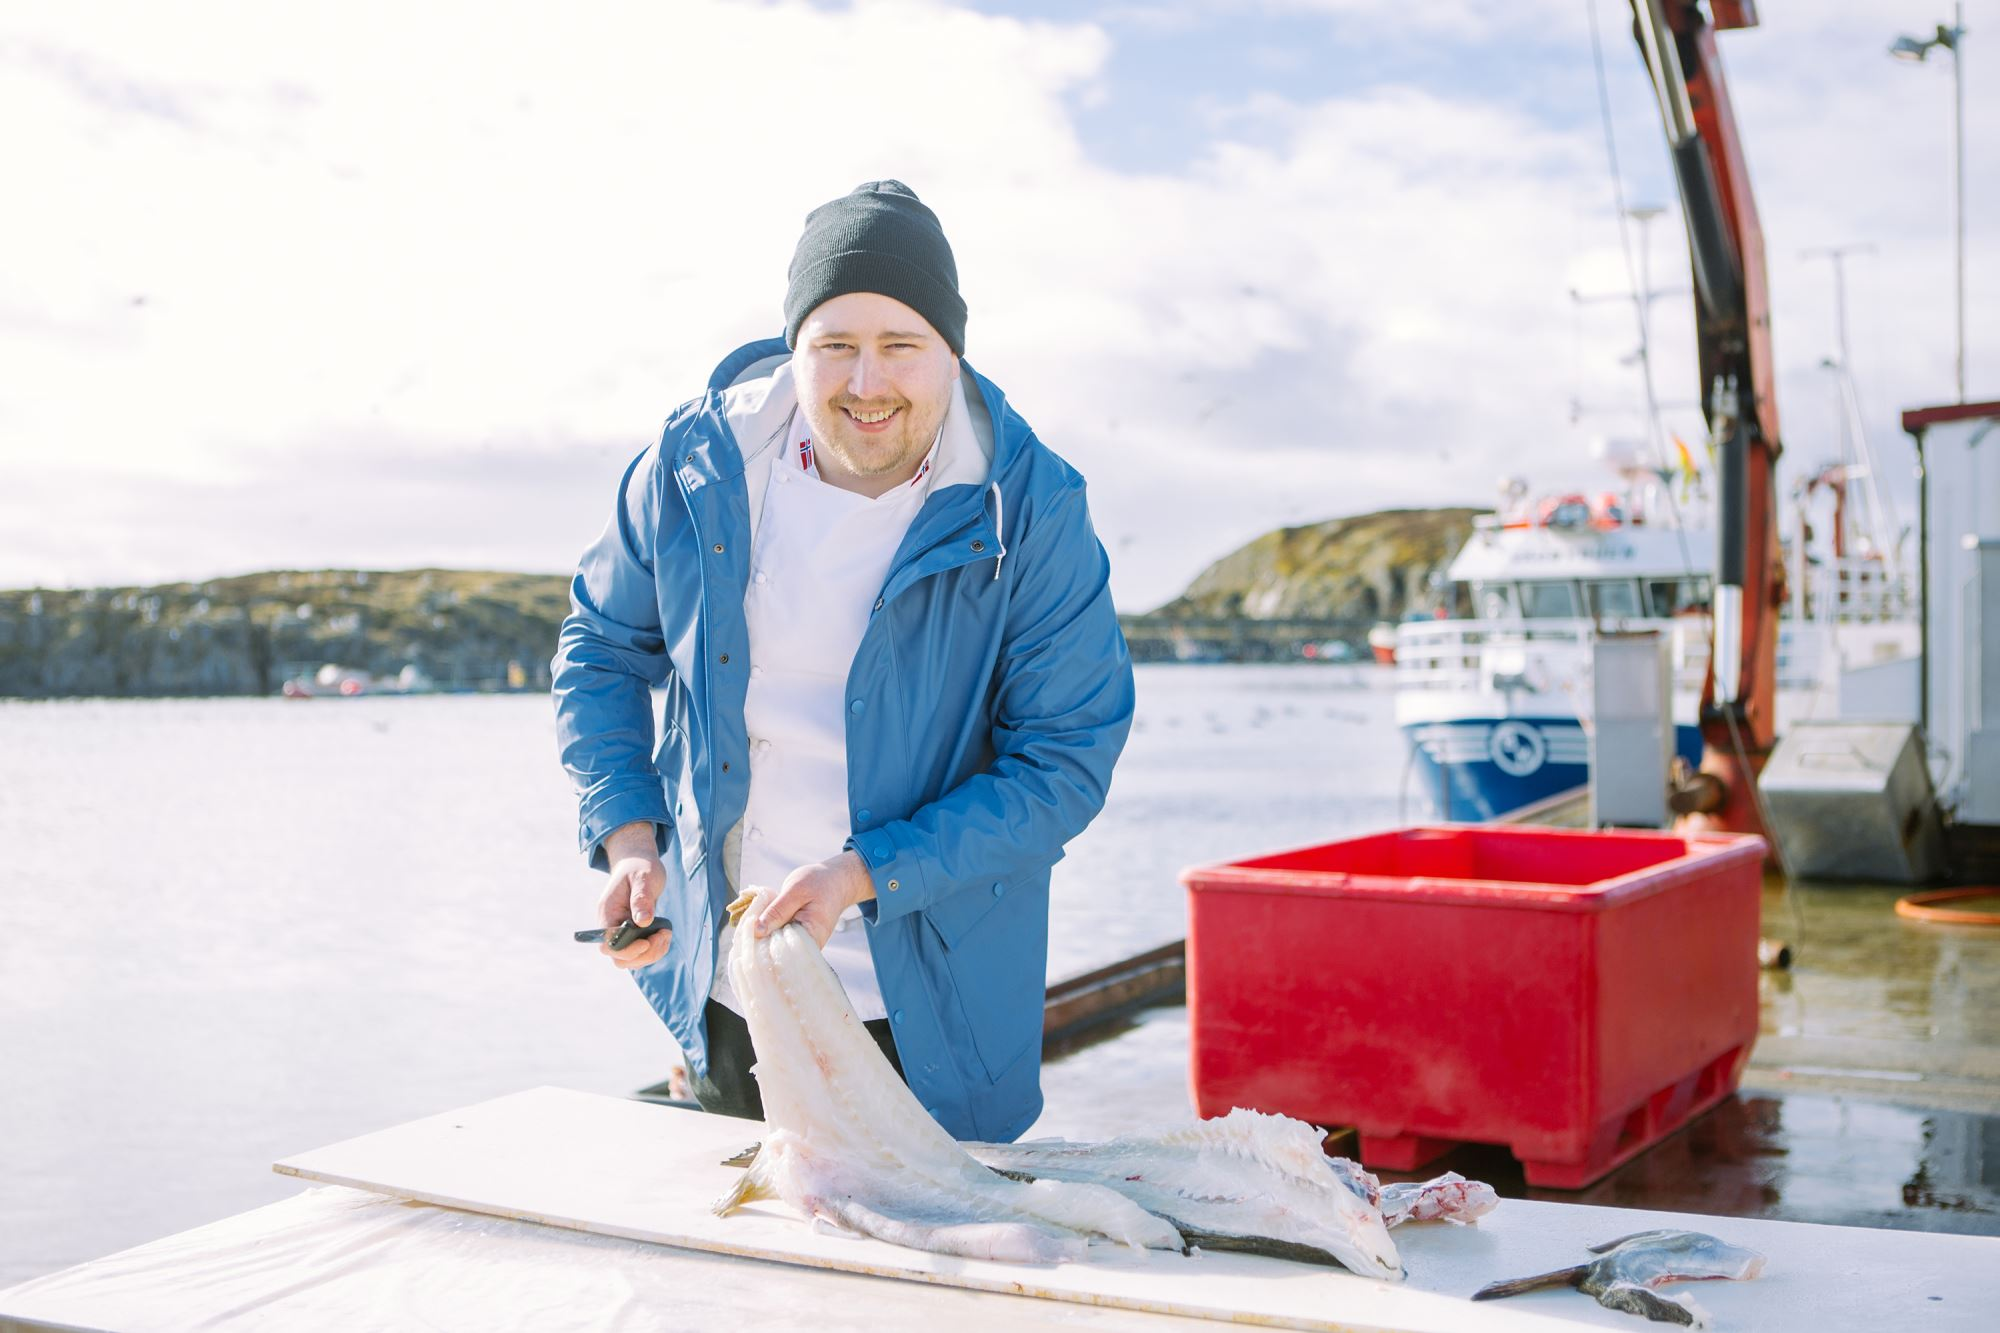 The cod fish festival in Rørvik